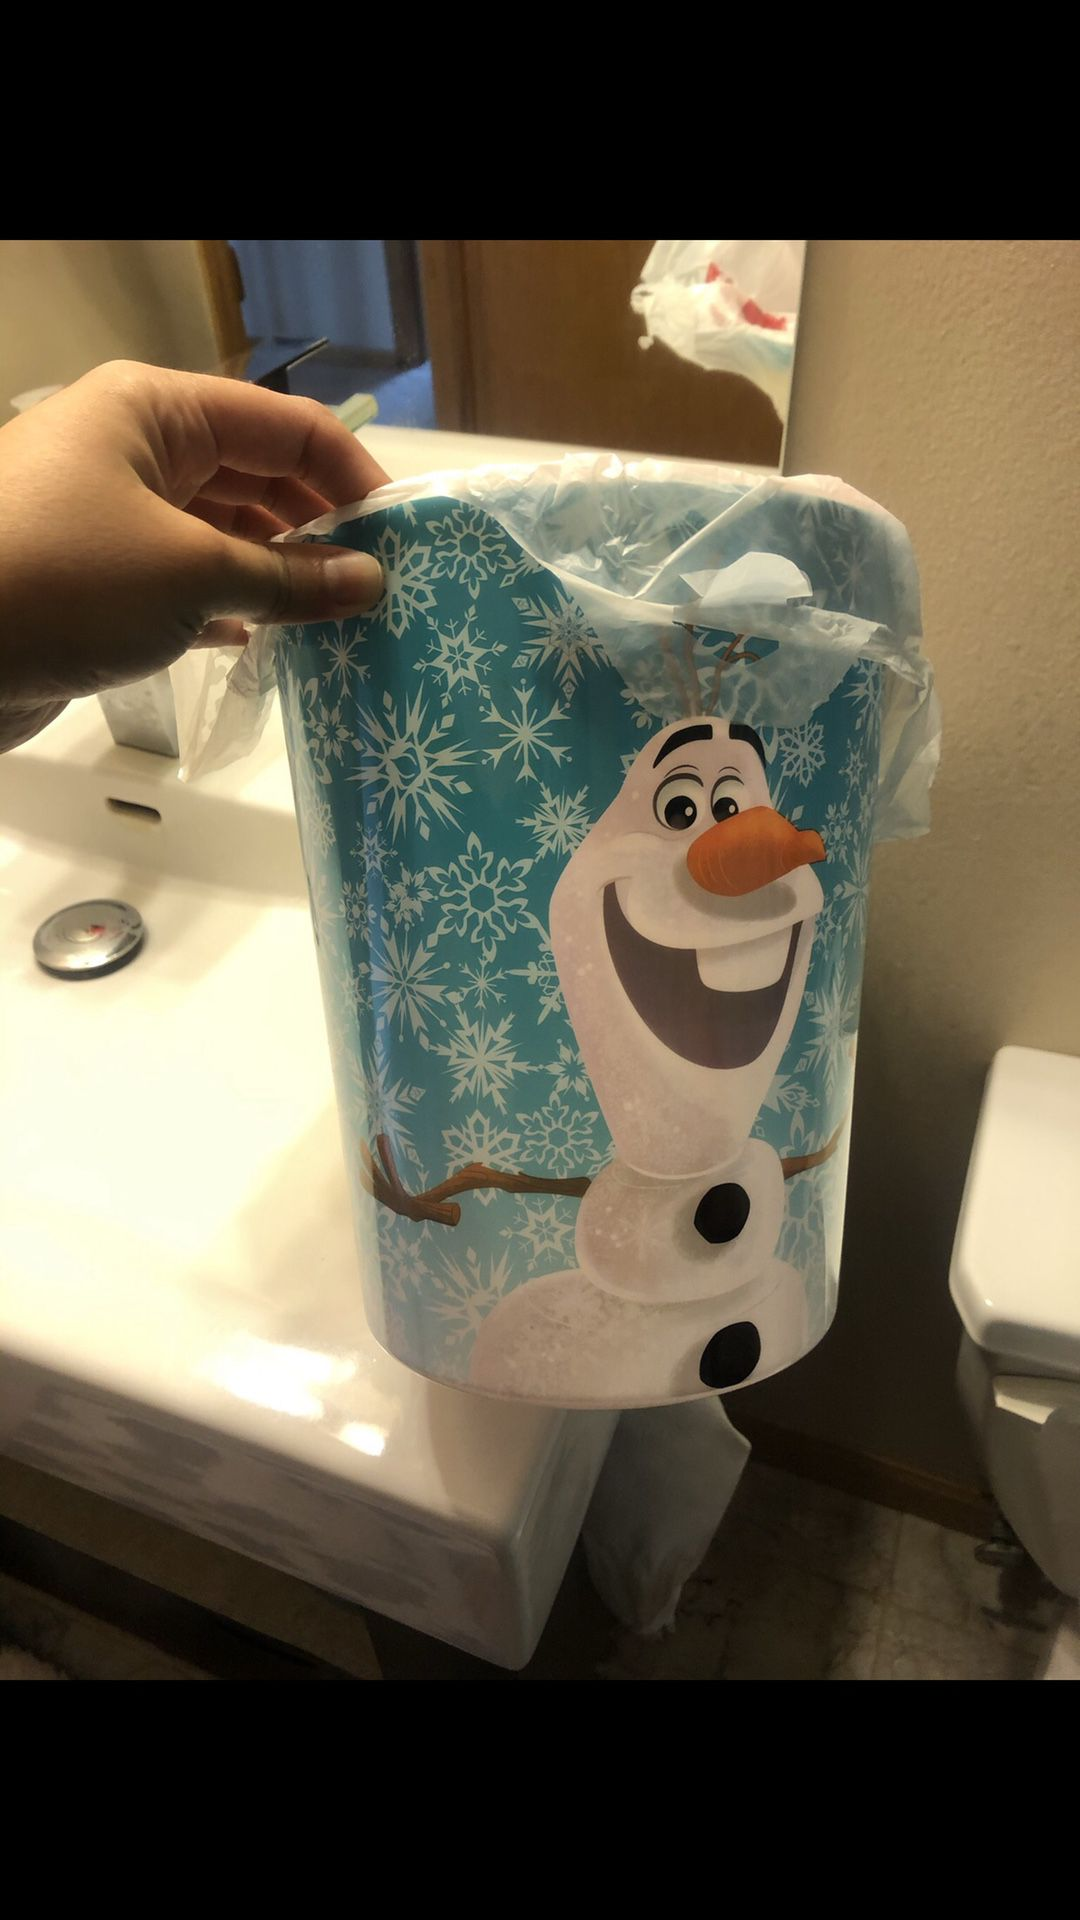 Frozan Bathroom Curtain, Trash can Toothbrush Holder